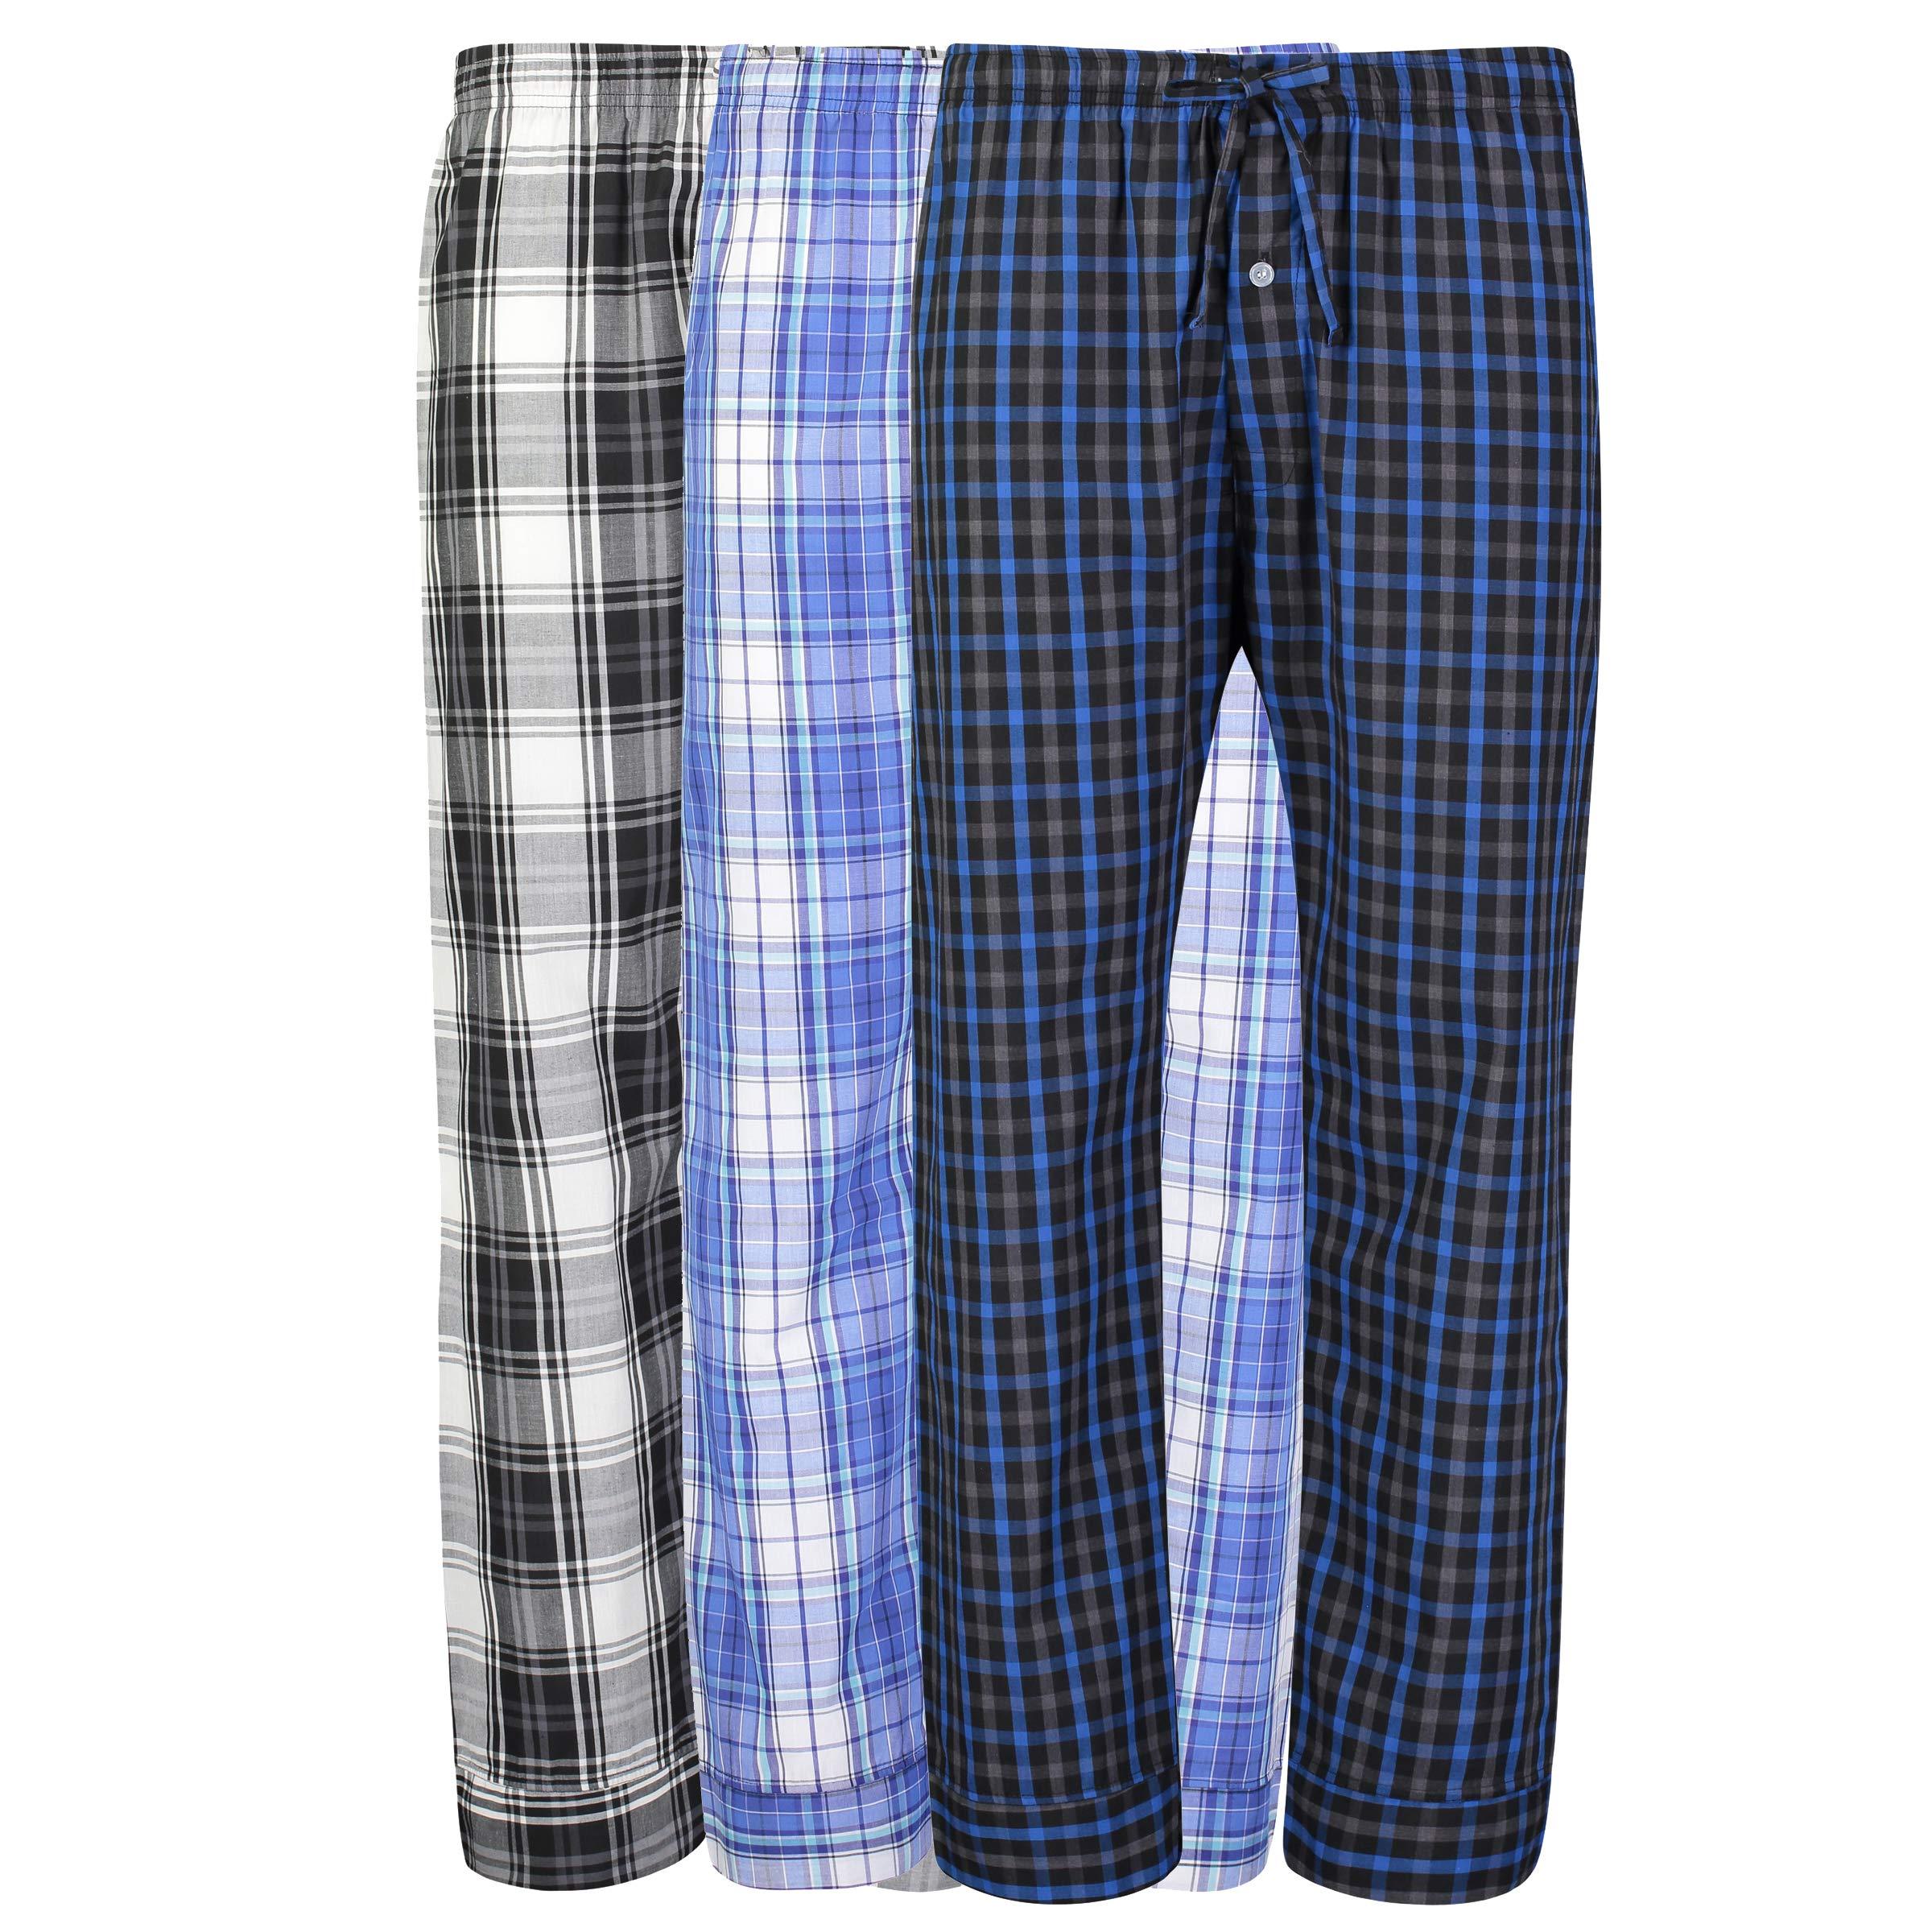 Mens 3 Pack Woven Pajama Pants Lounge Pants Sleep Pants Sleepwear Assorted Various Plaids (Large)